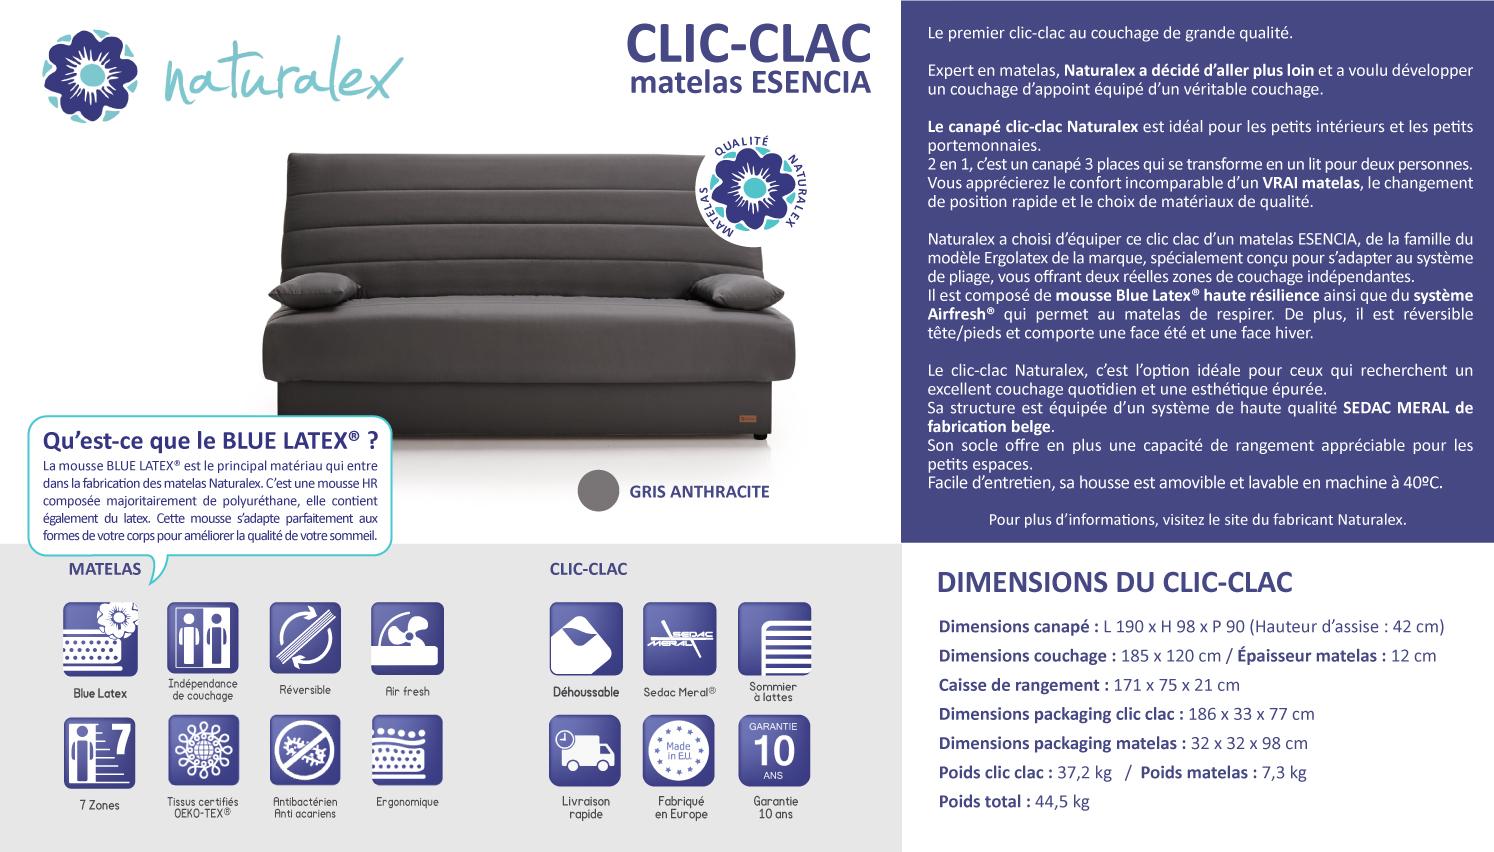 banquette clic clac 3 places matelas naturalex canap convertible achat vente clic clac. Black Bedroom Furniture Sets. Home Design Ideas